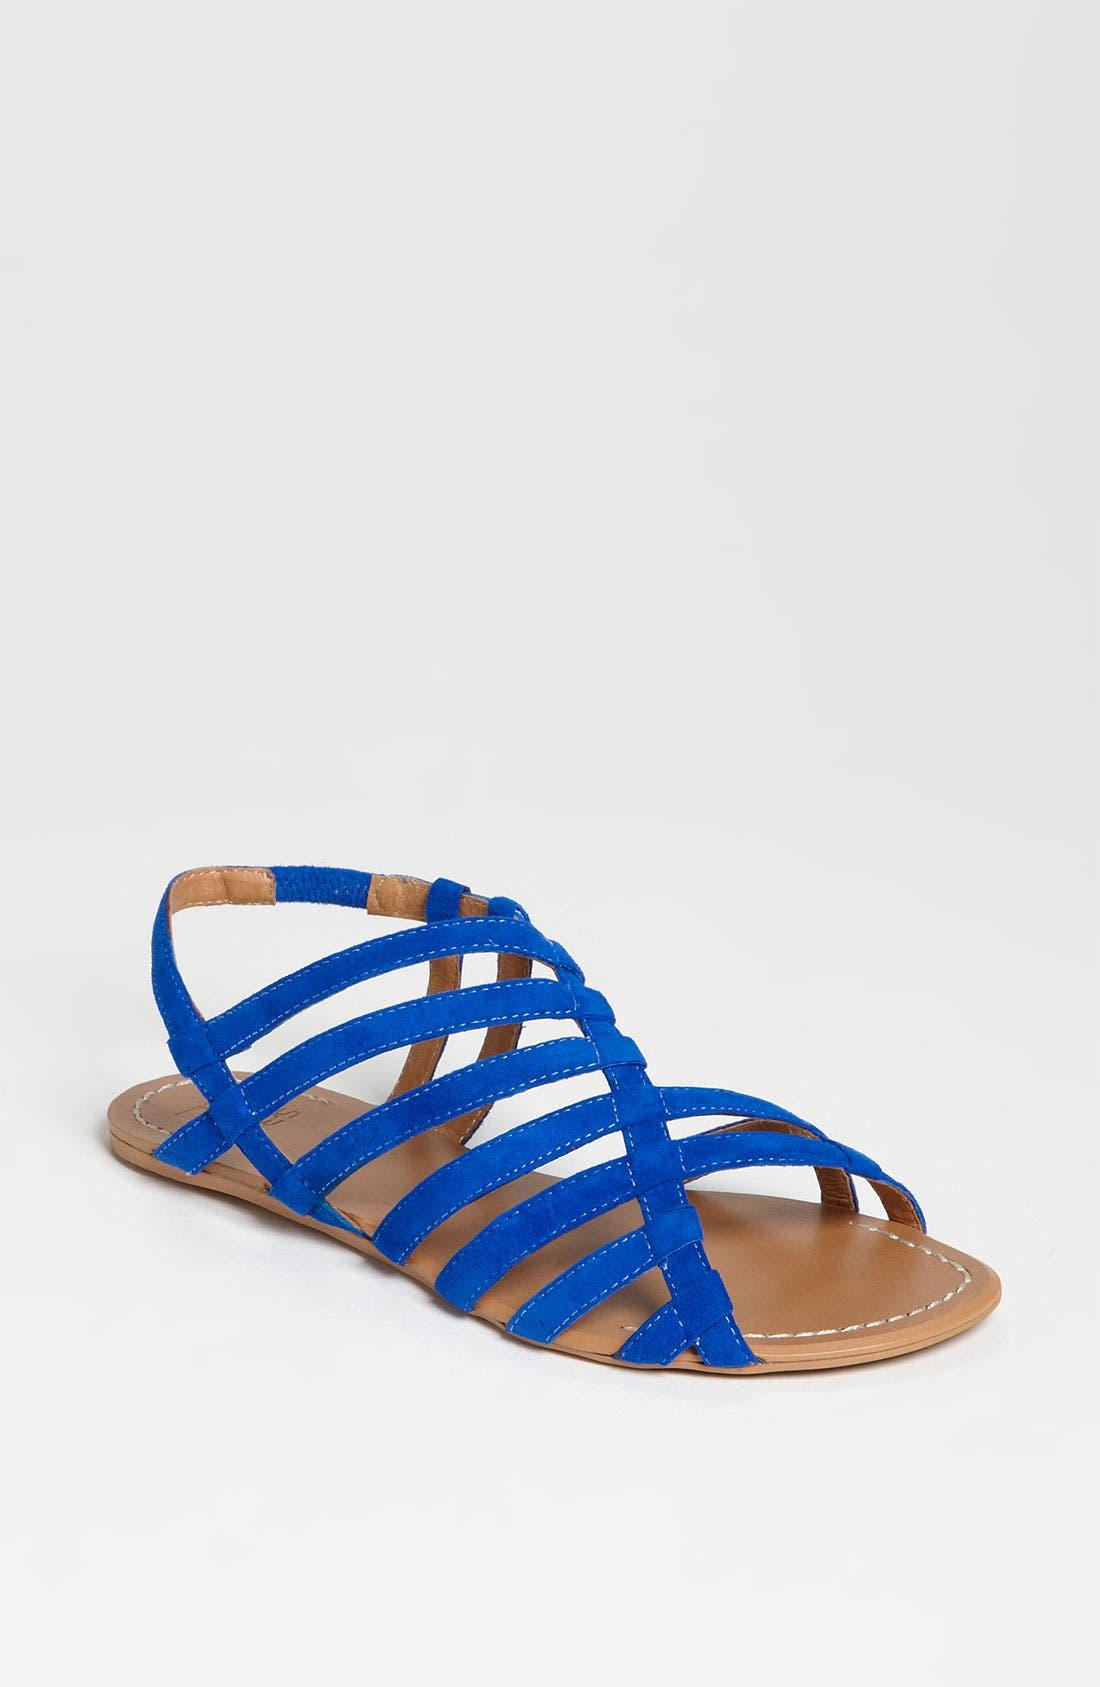 Alternate Image 1 Selected - Joe's 'Tina' Sandal